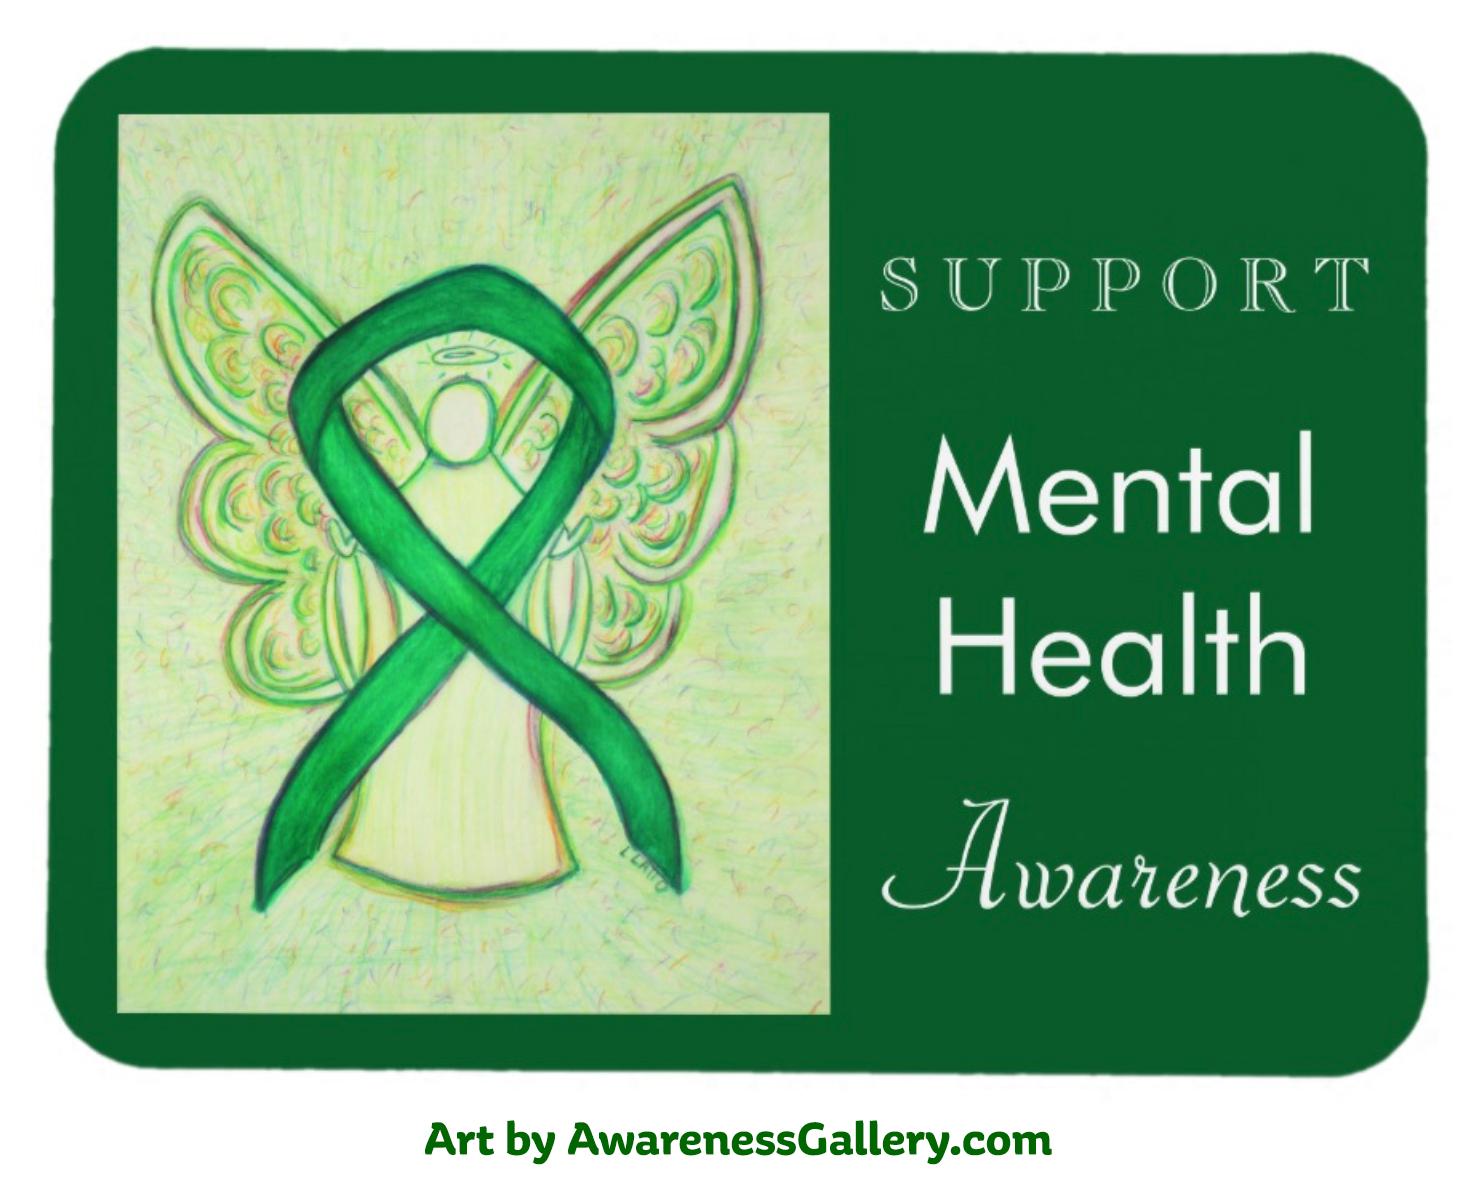 Green Mental Health Awareness Ribbon Custom Gifts and Merchandise - Awareness Gallery Art